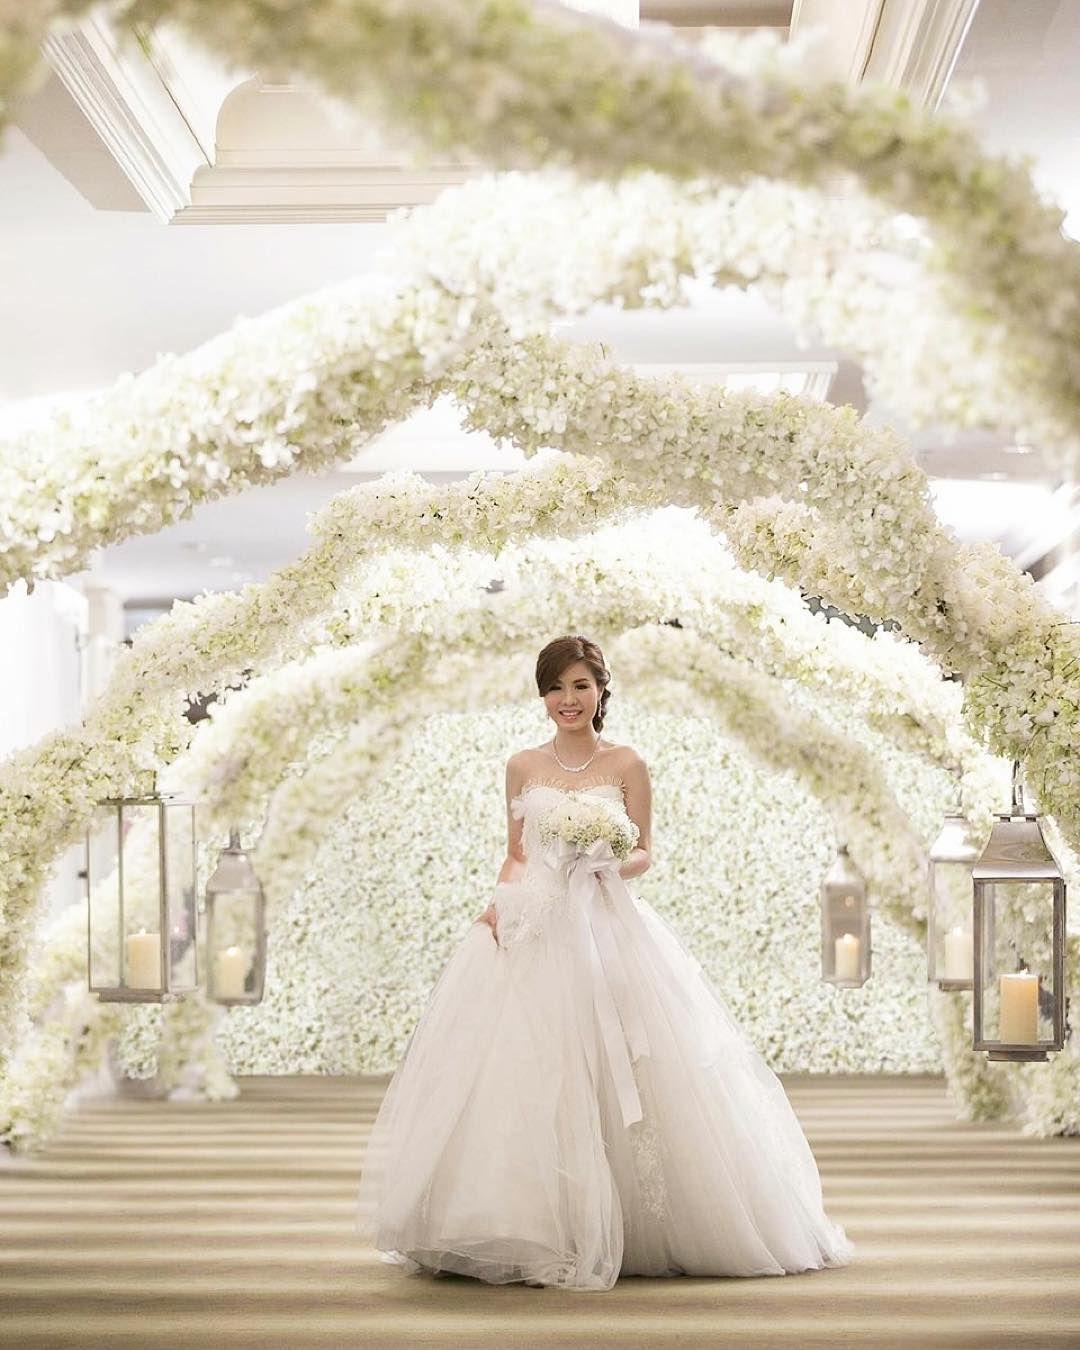 """Sophisticated Heaven.  #SophisticatedHeaven  #ChicPlanner #WeddingDesign  #FreshFlowers #Beauty"""